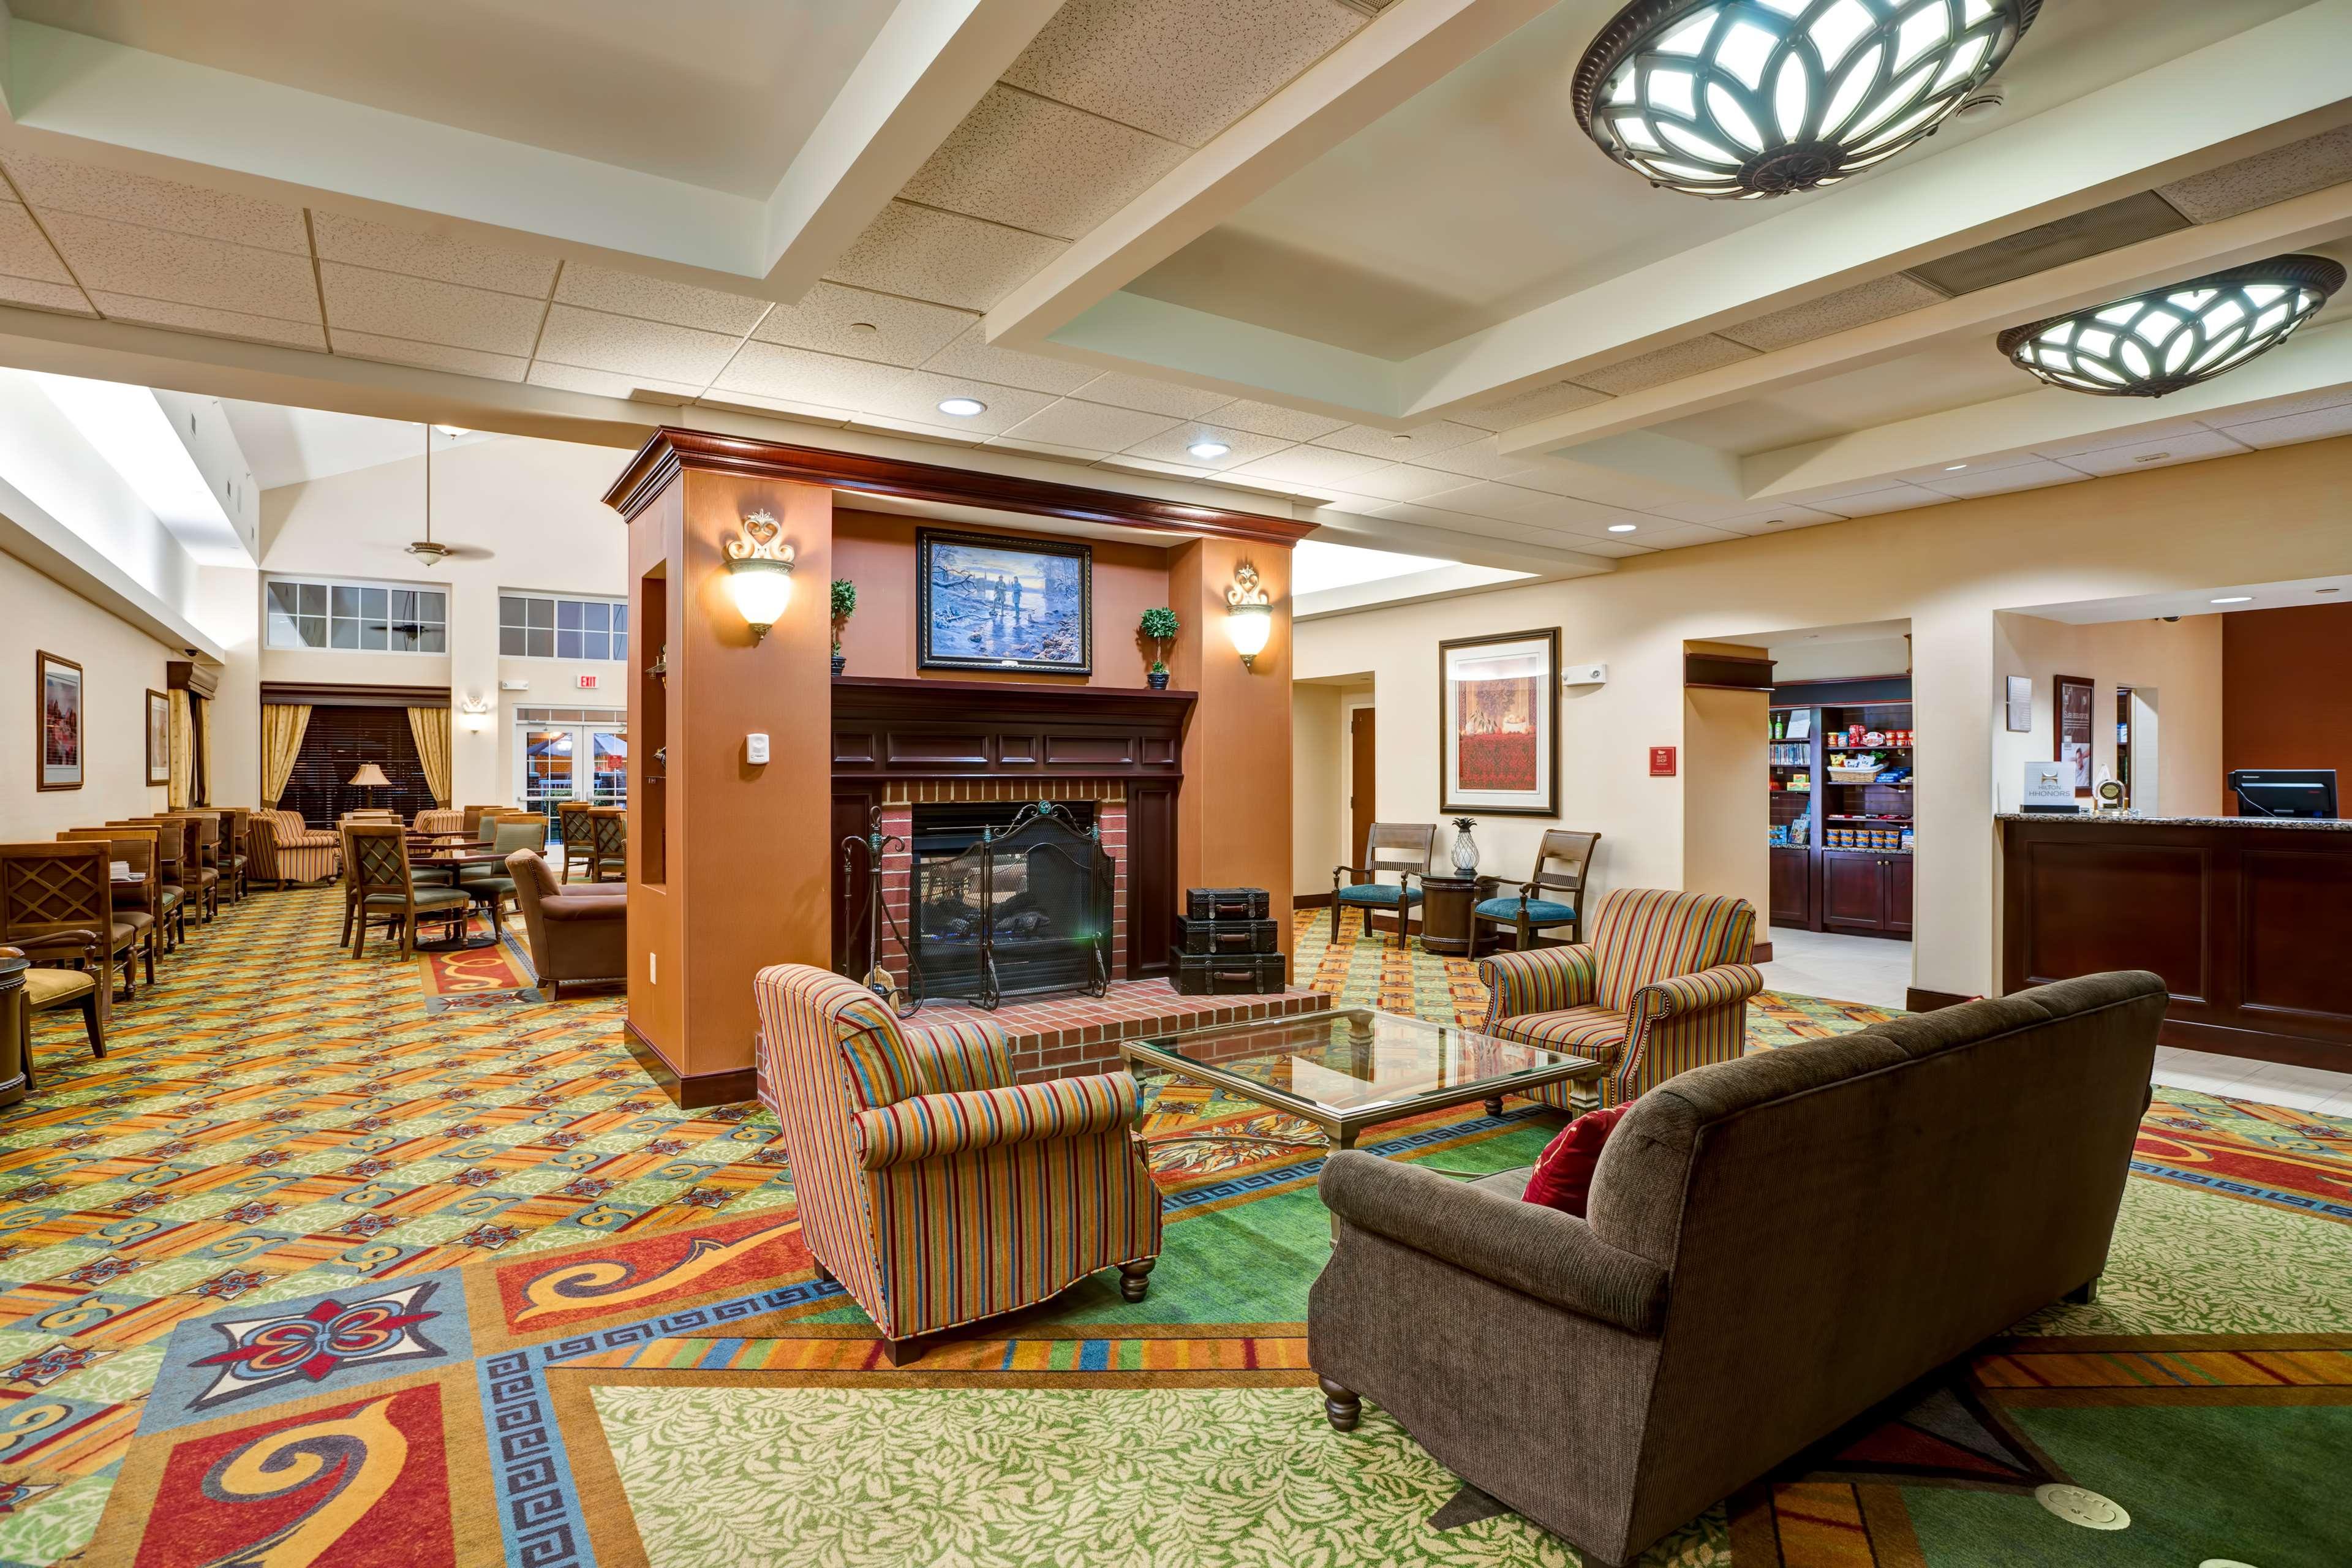 Homewood Suites by Hilton Fredericksburg image 3